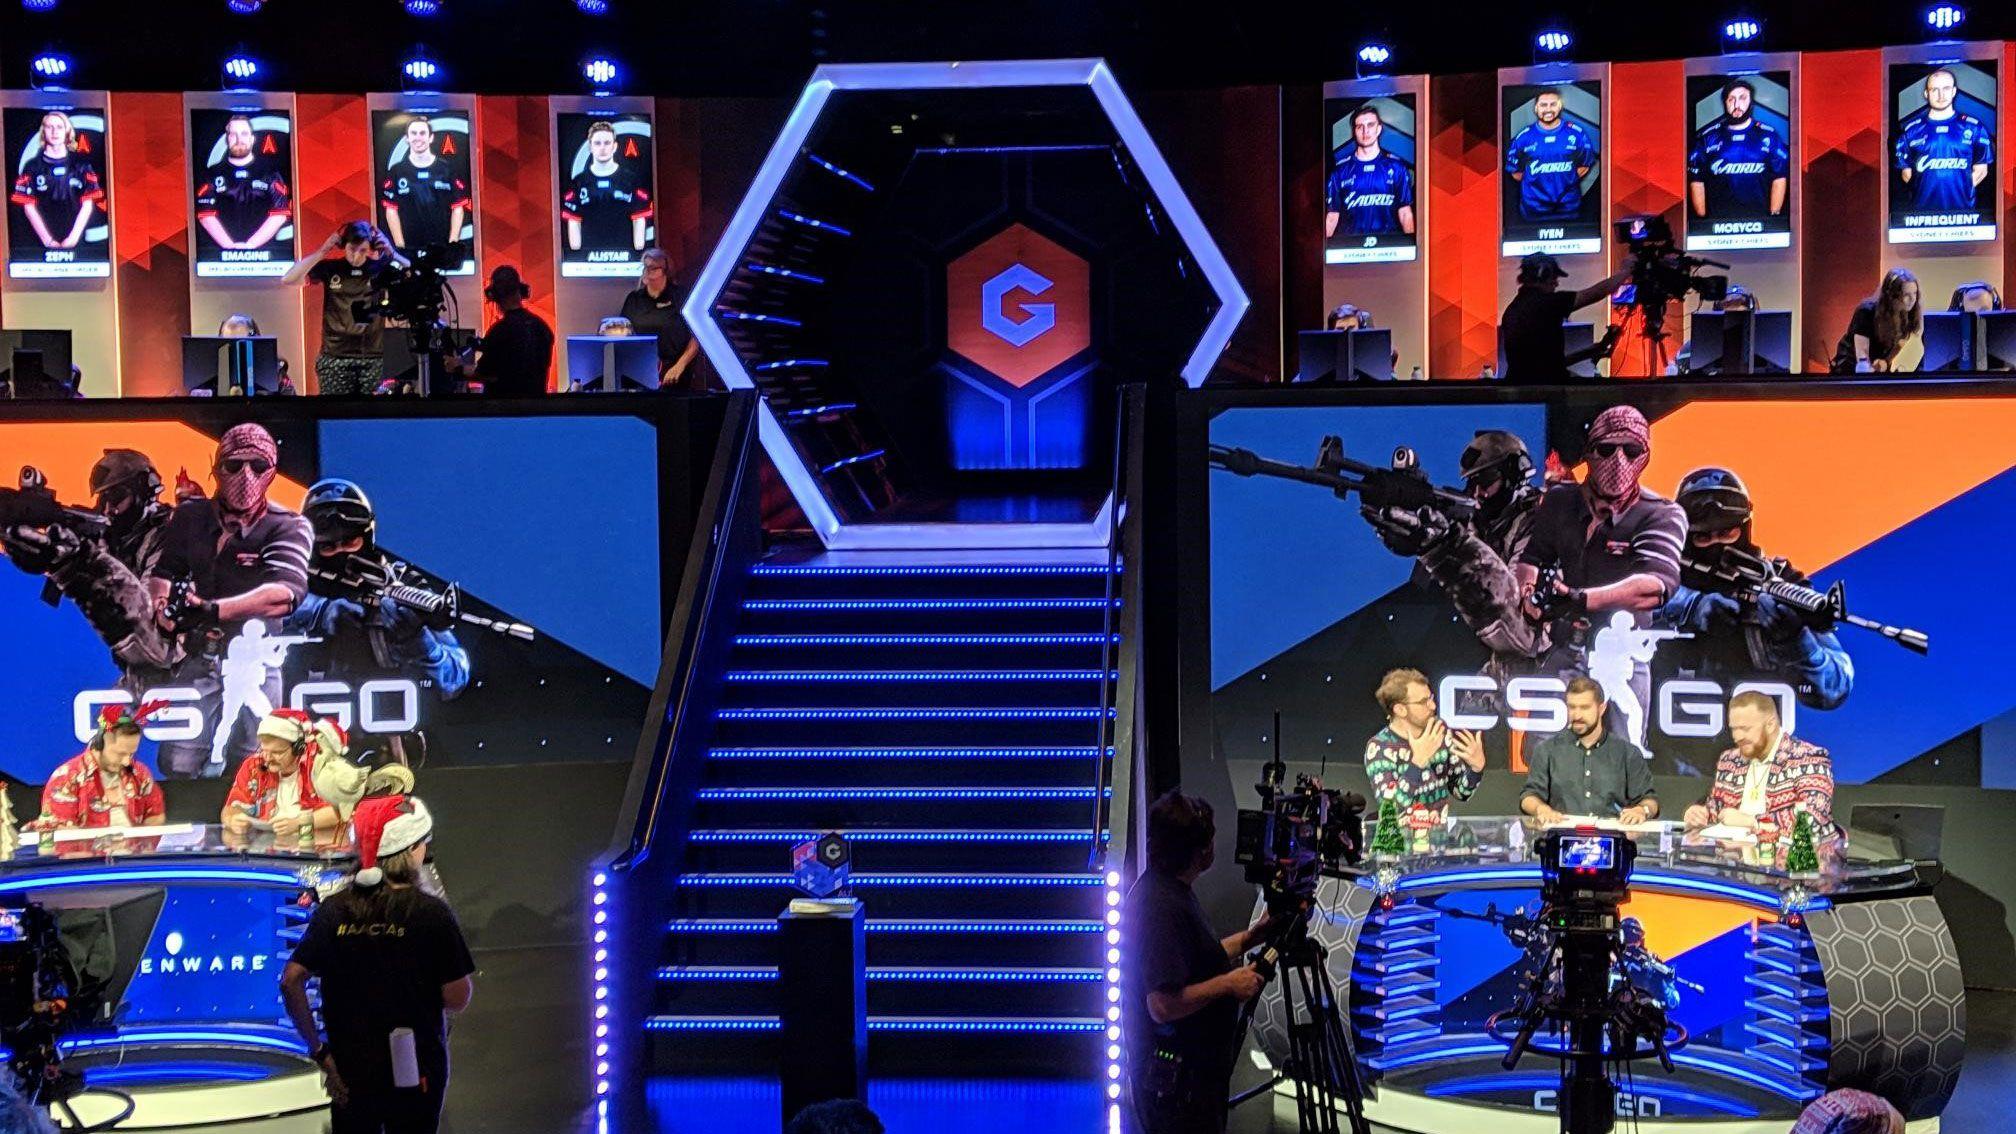 Melbourne Order dominates Gfinity Elite series